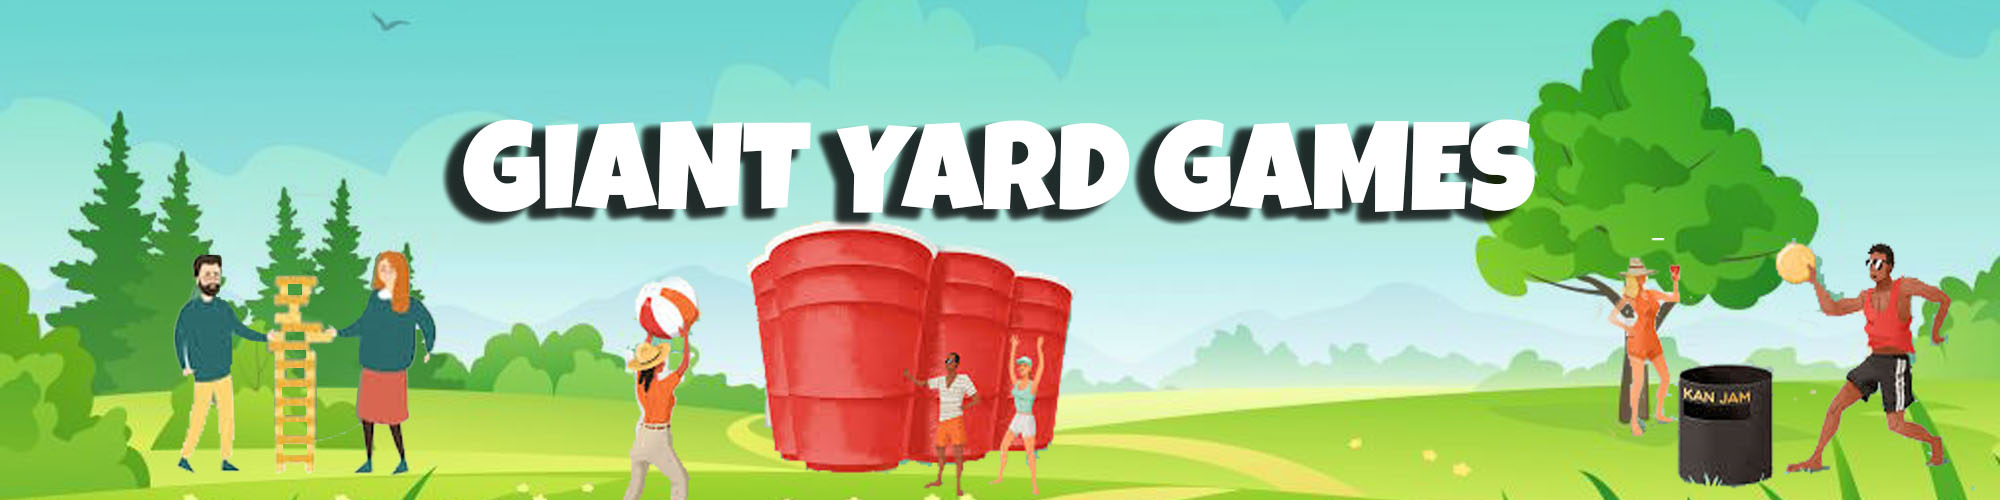 Giant Yard Game Rentals